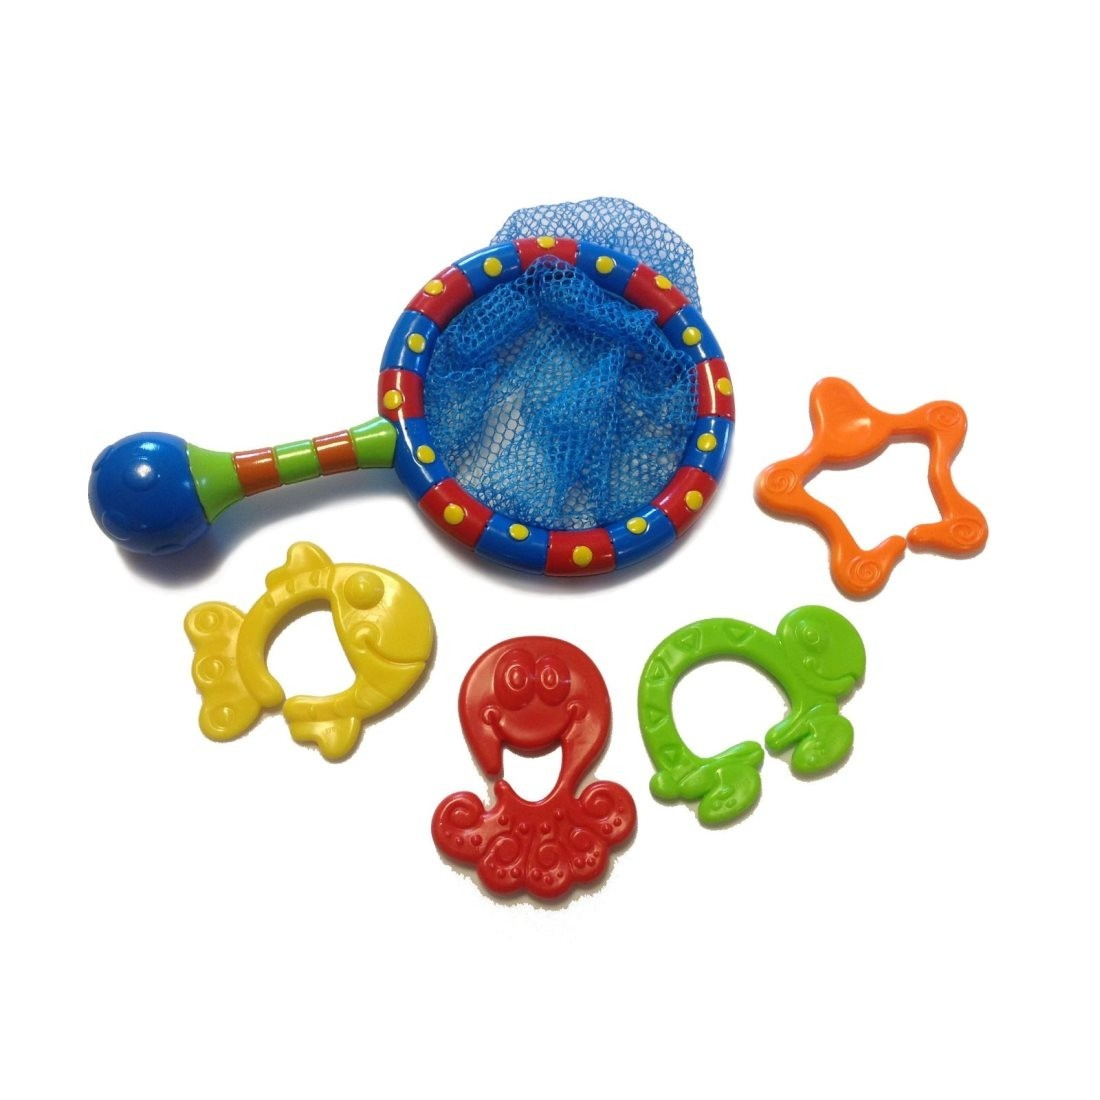 Nuby splash n 39 catch fishing net baby bath time fun for Fishing toy set